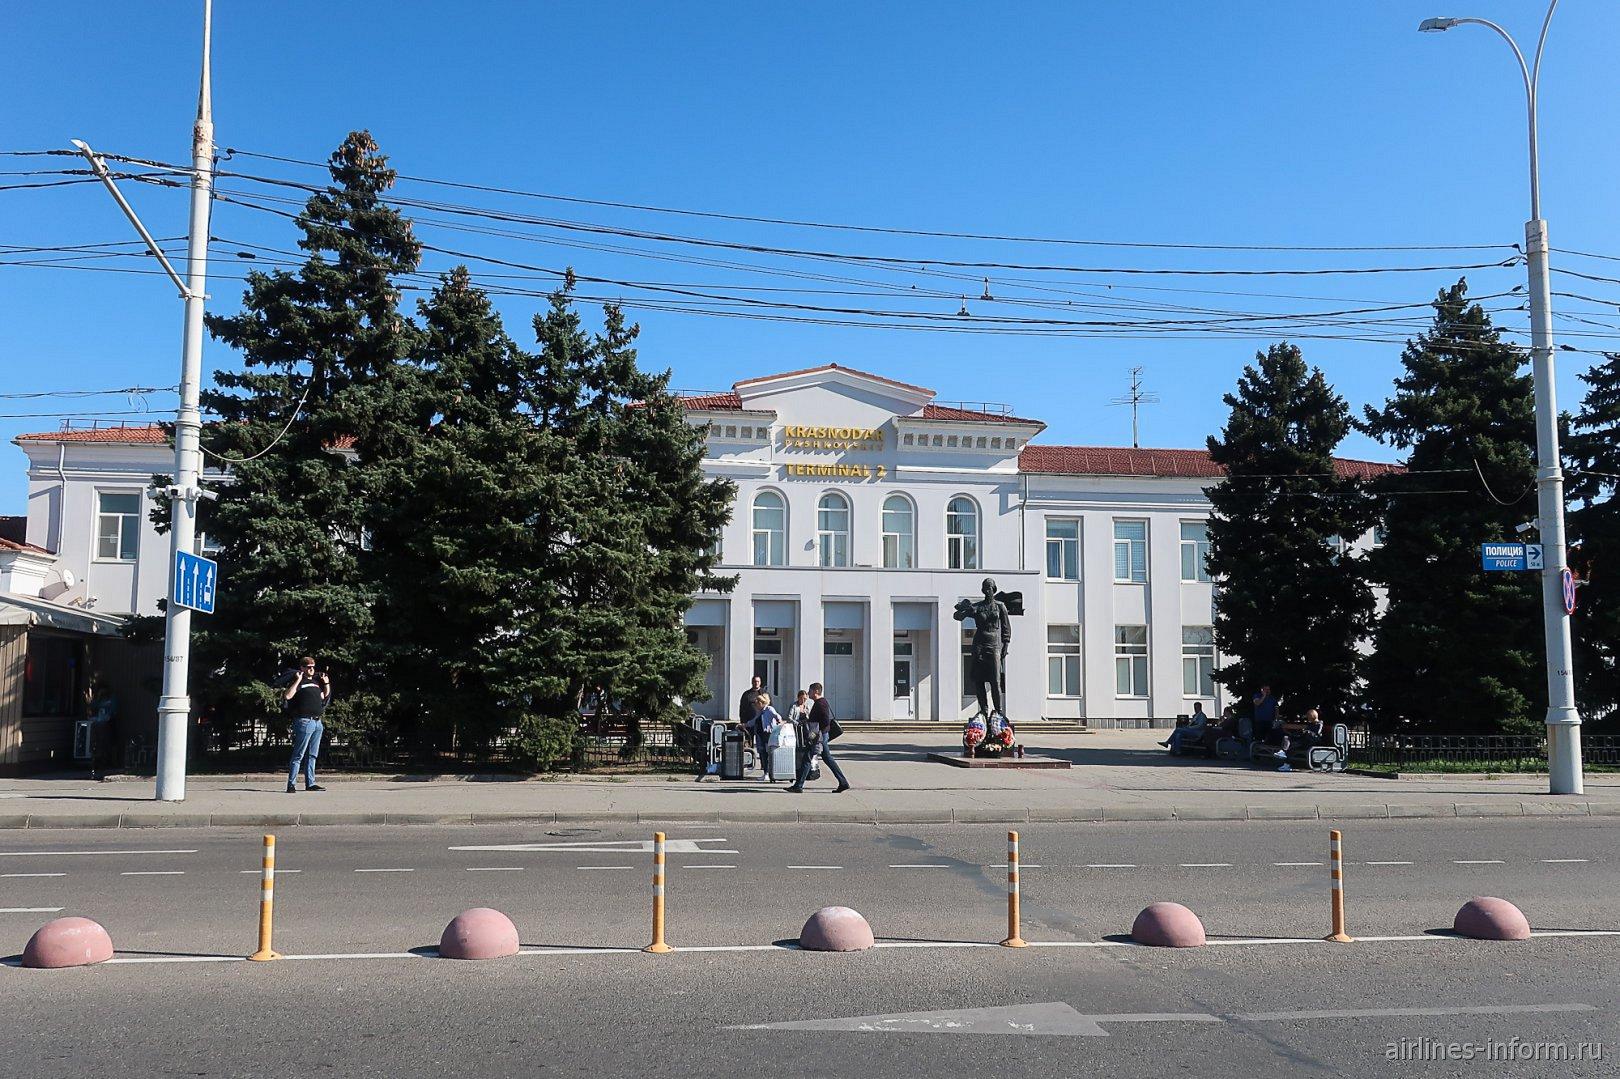 Терминал 2 международных авиалиний аэропорта Краснодар Пашковский